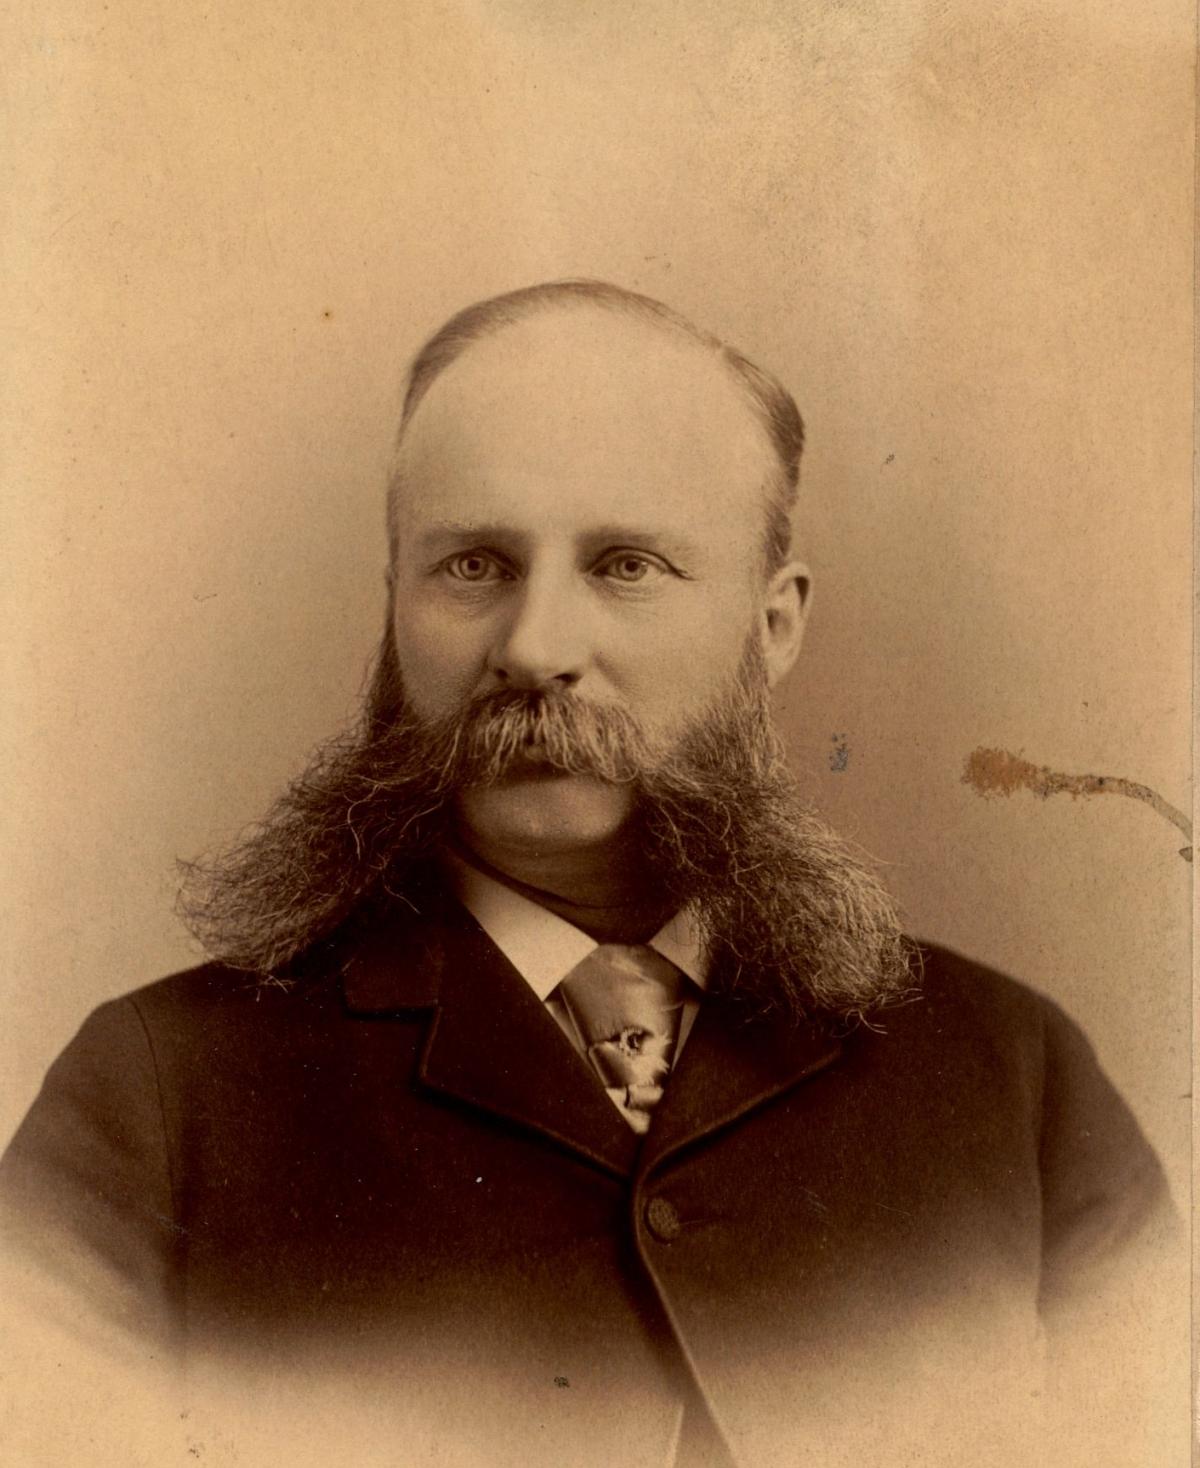 1880s man with facial hair